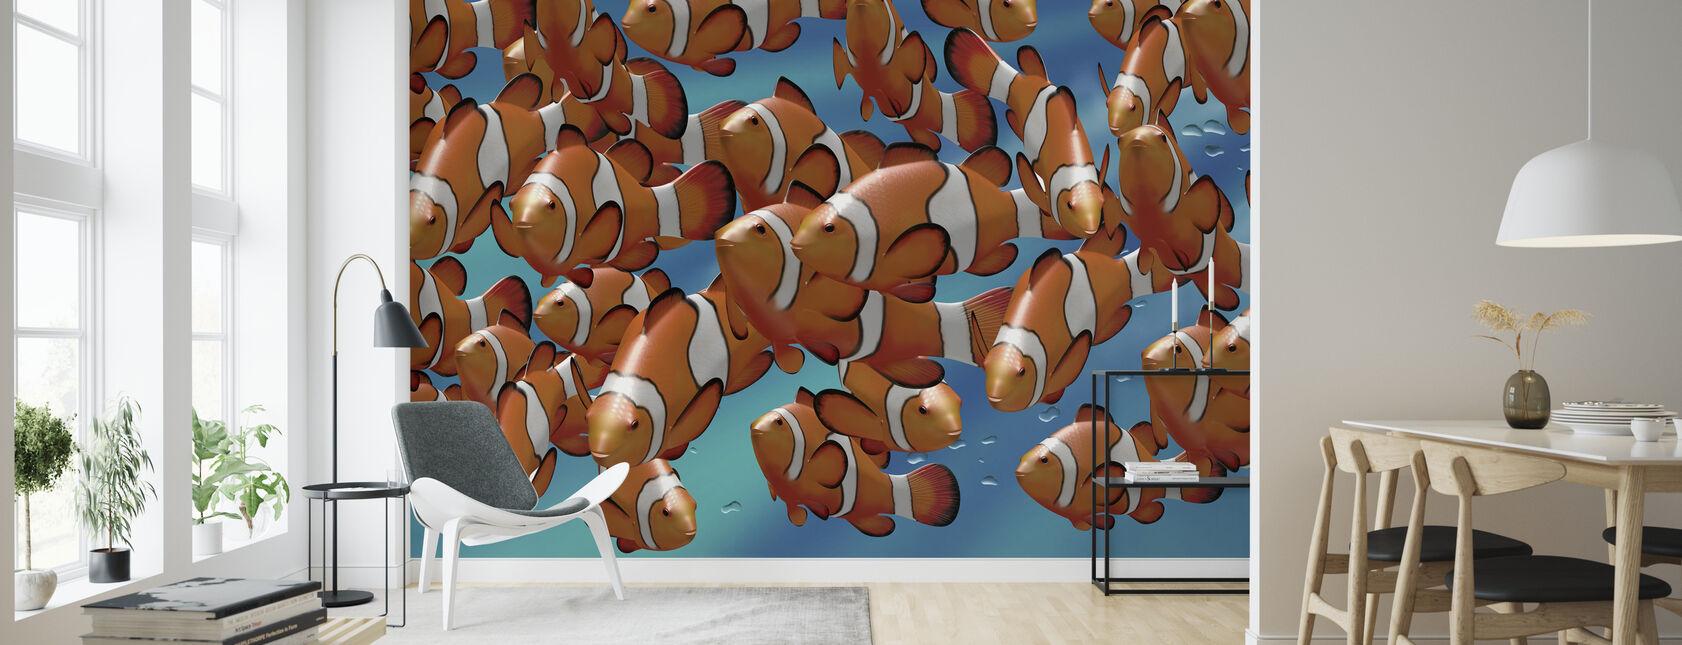 Clown Fish - Wallpaper - Living Room